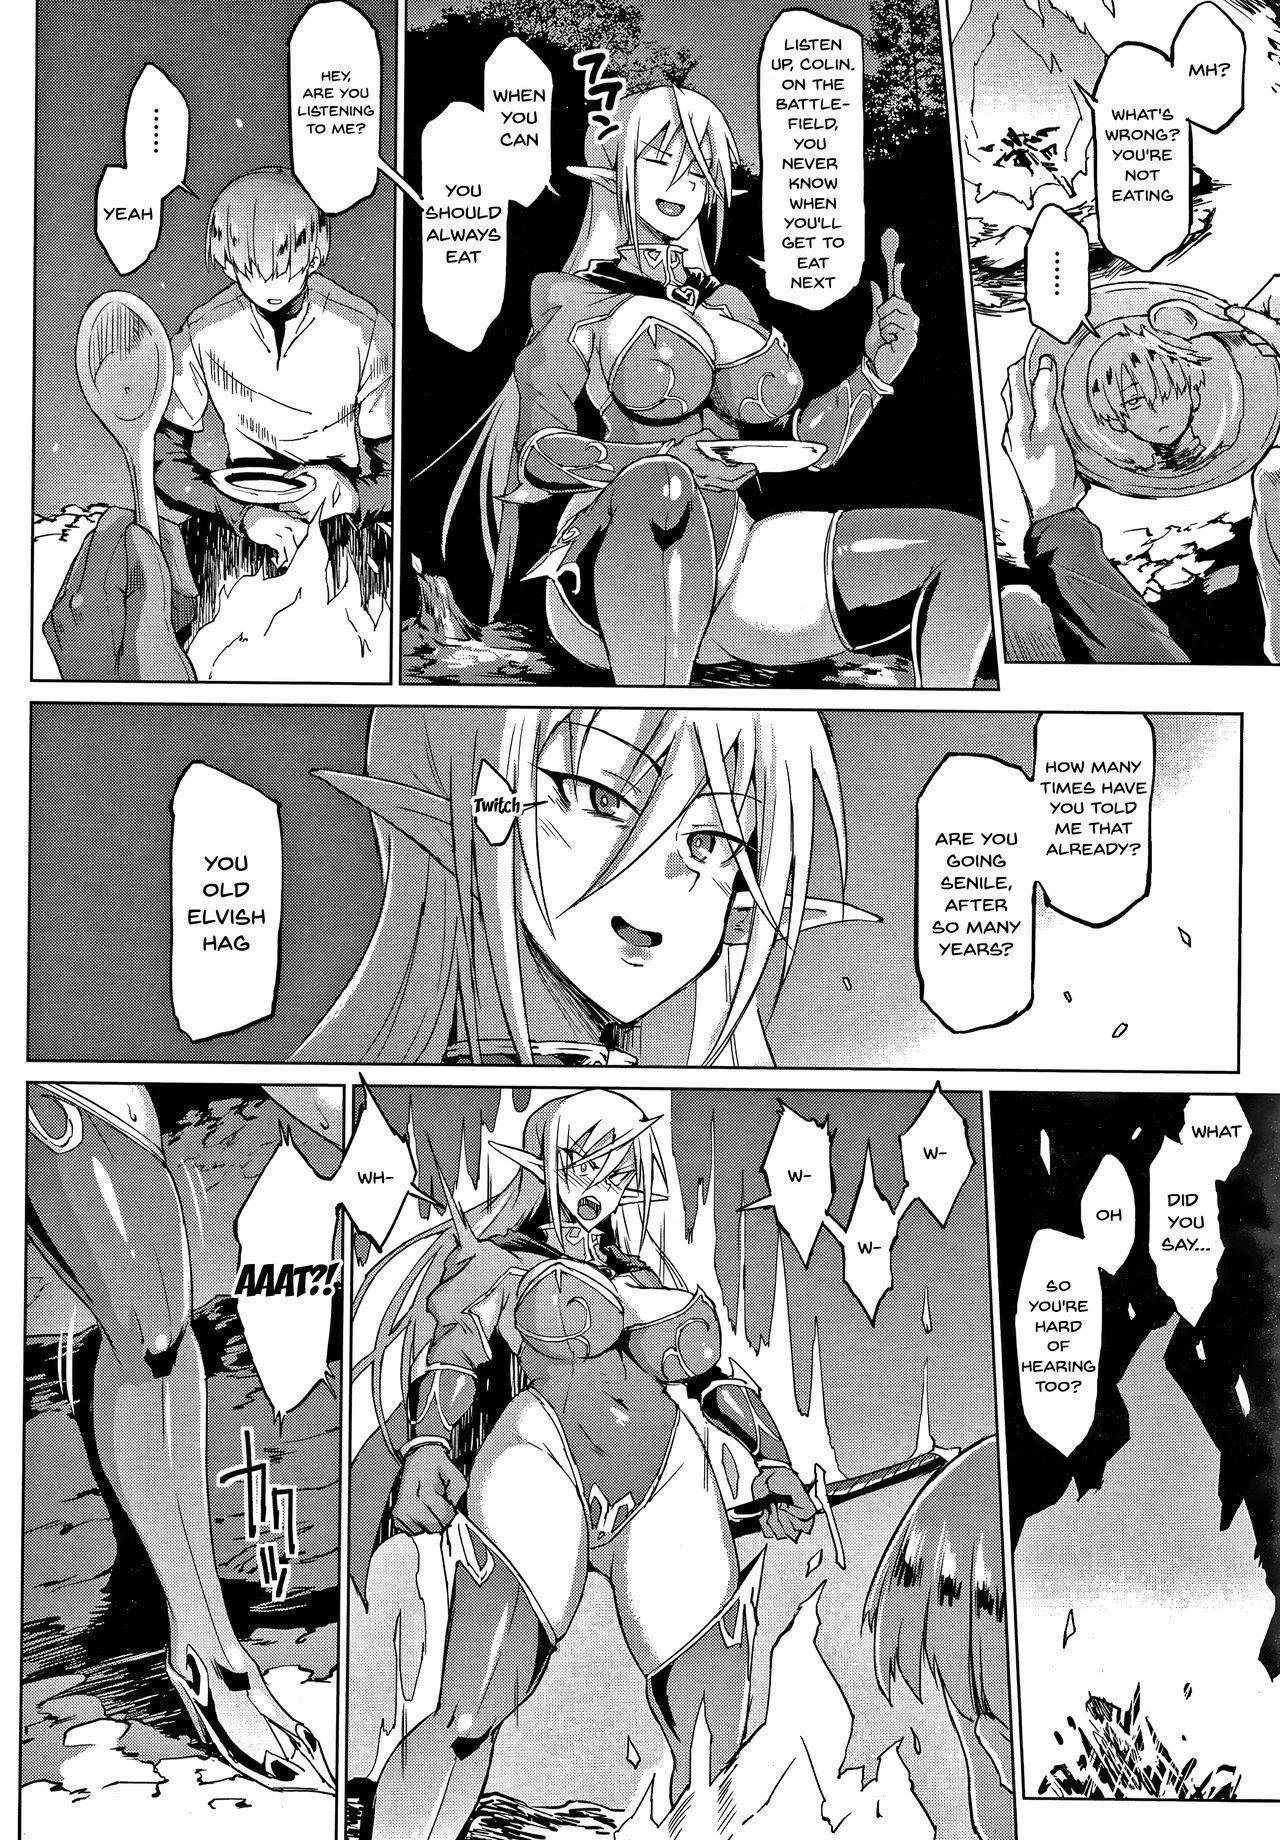 [Fan no Hitori] Sennen Reijou ~My Lady, My Master~  Ch.1-6 [English] {Doujins.com} 8